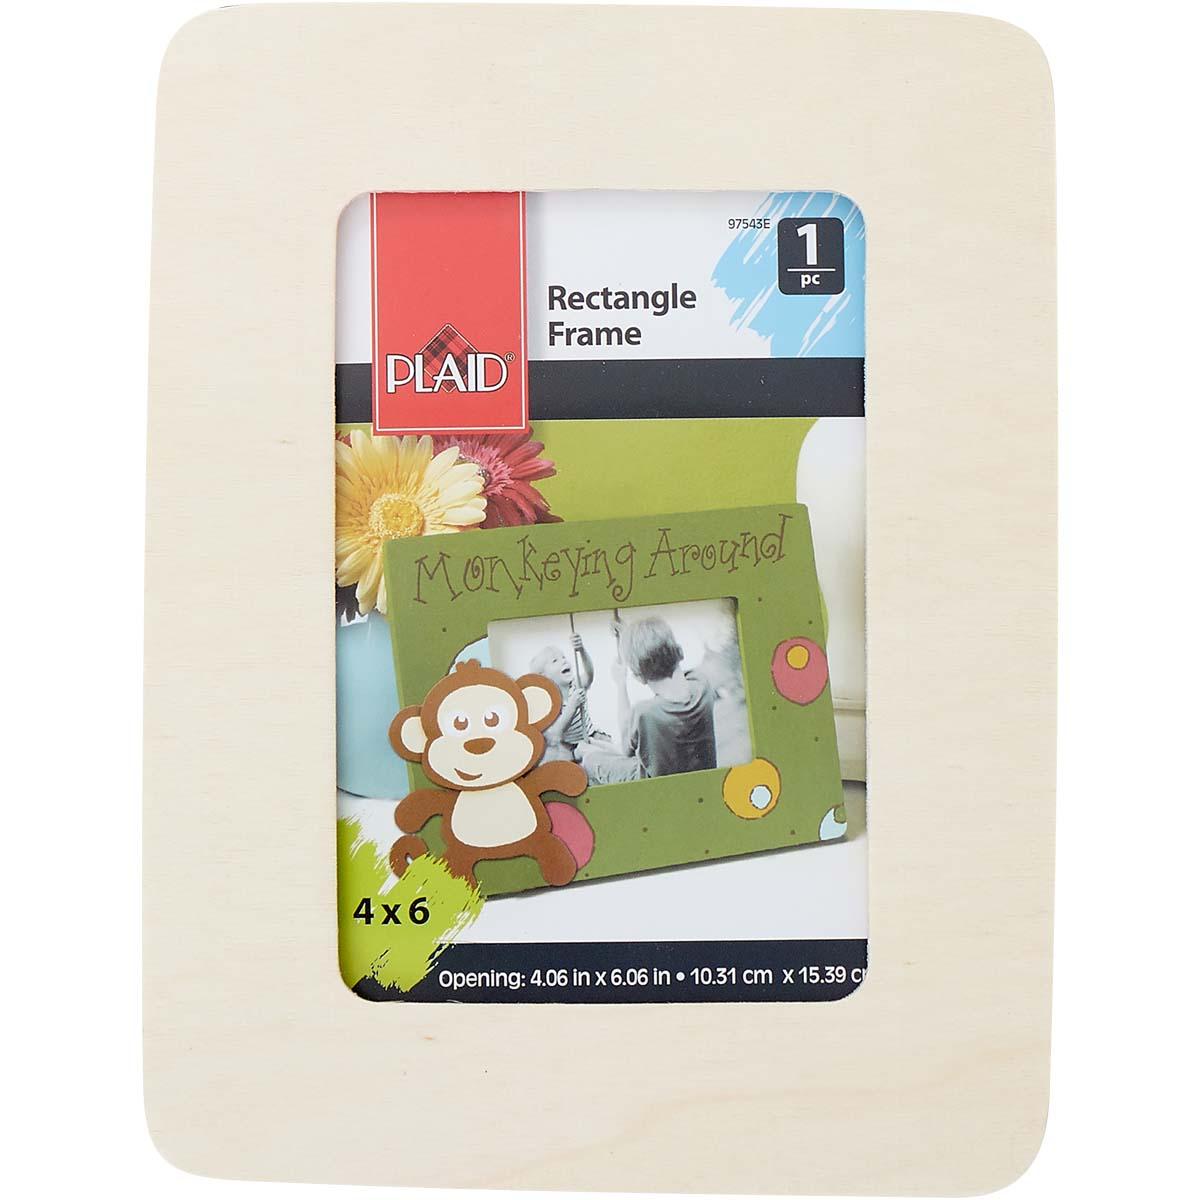 Plaid ® Wood Surfaces - Frames - Rectangle - 97543